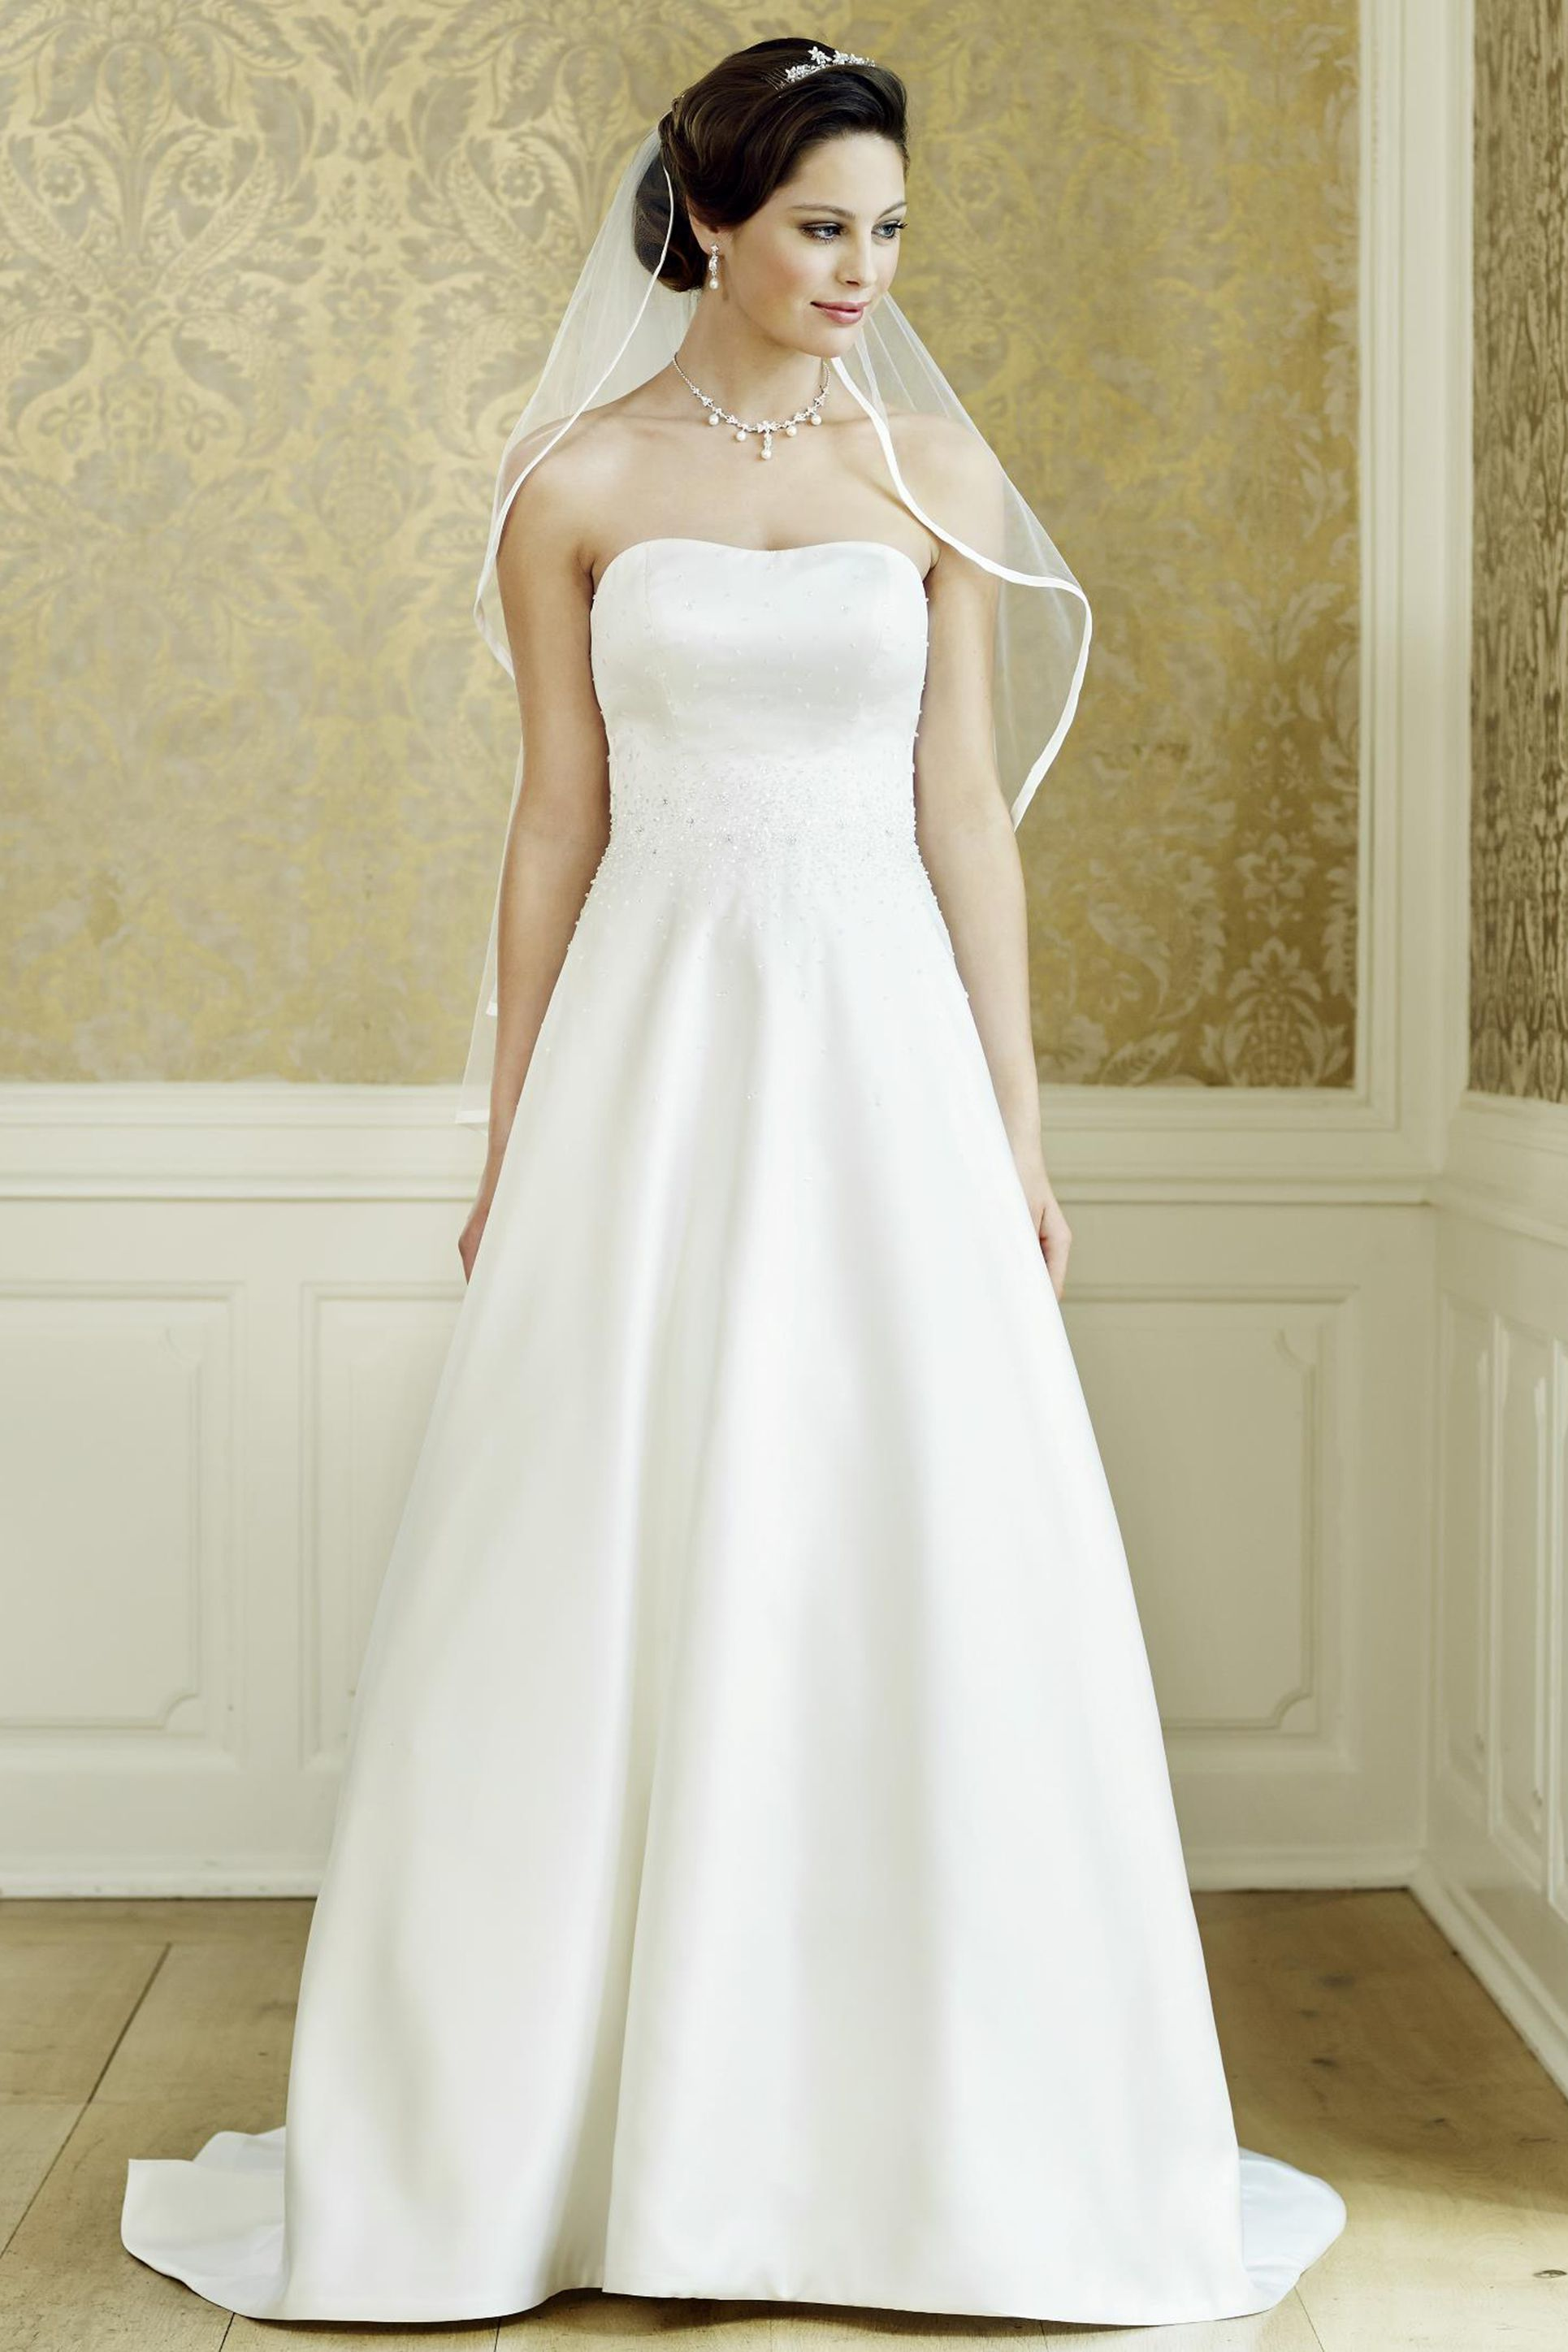 44db3df3725 Νυφικό «Lady» - Νυφικά Θρησκευτικού Γάμου   Νυφικά Είμαι Νύφη